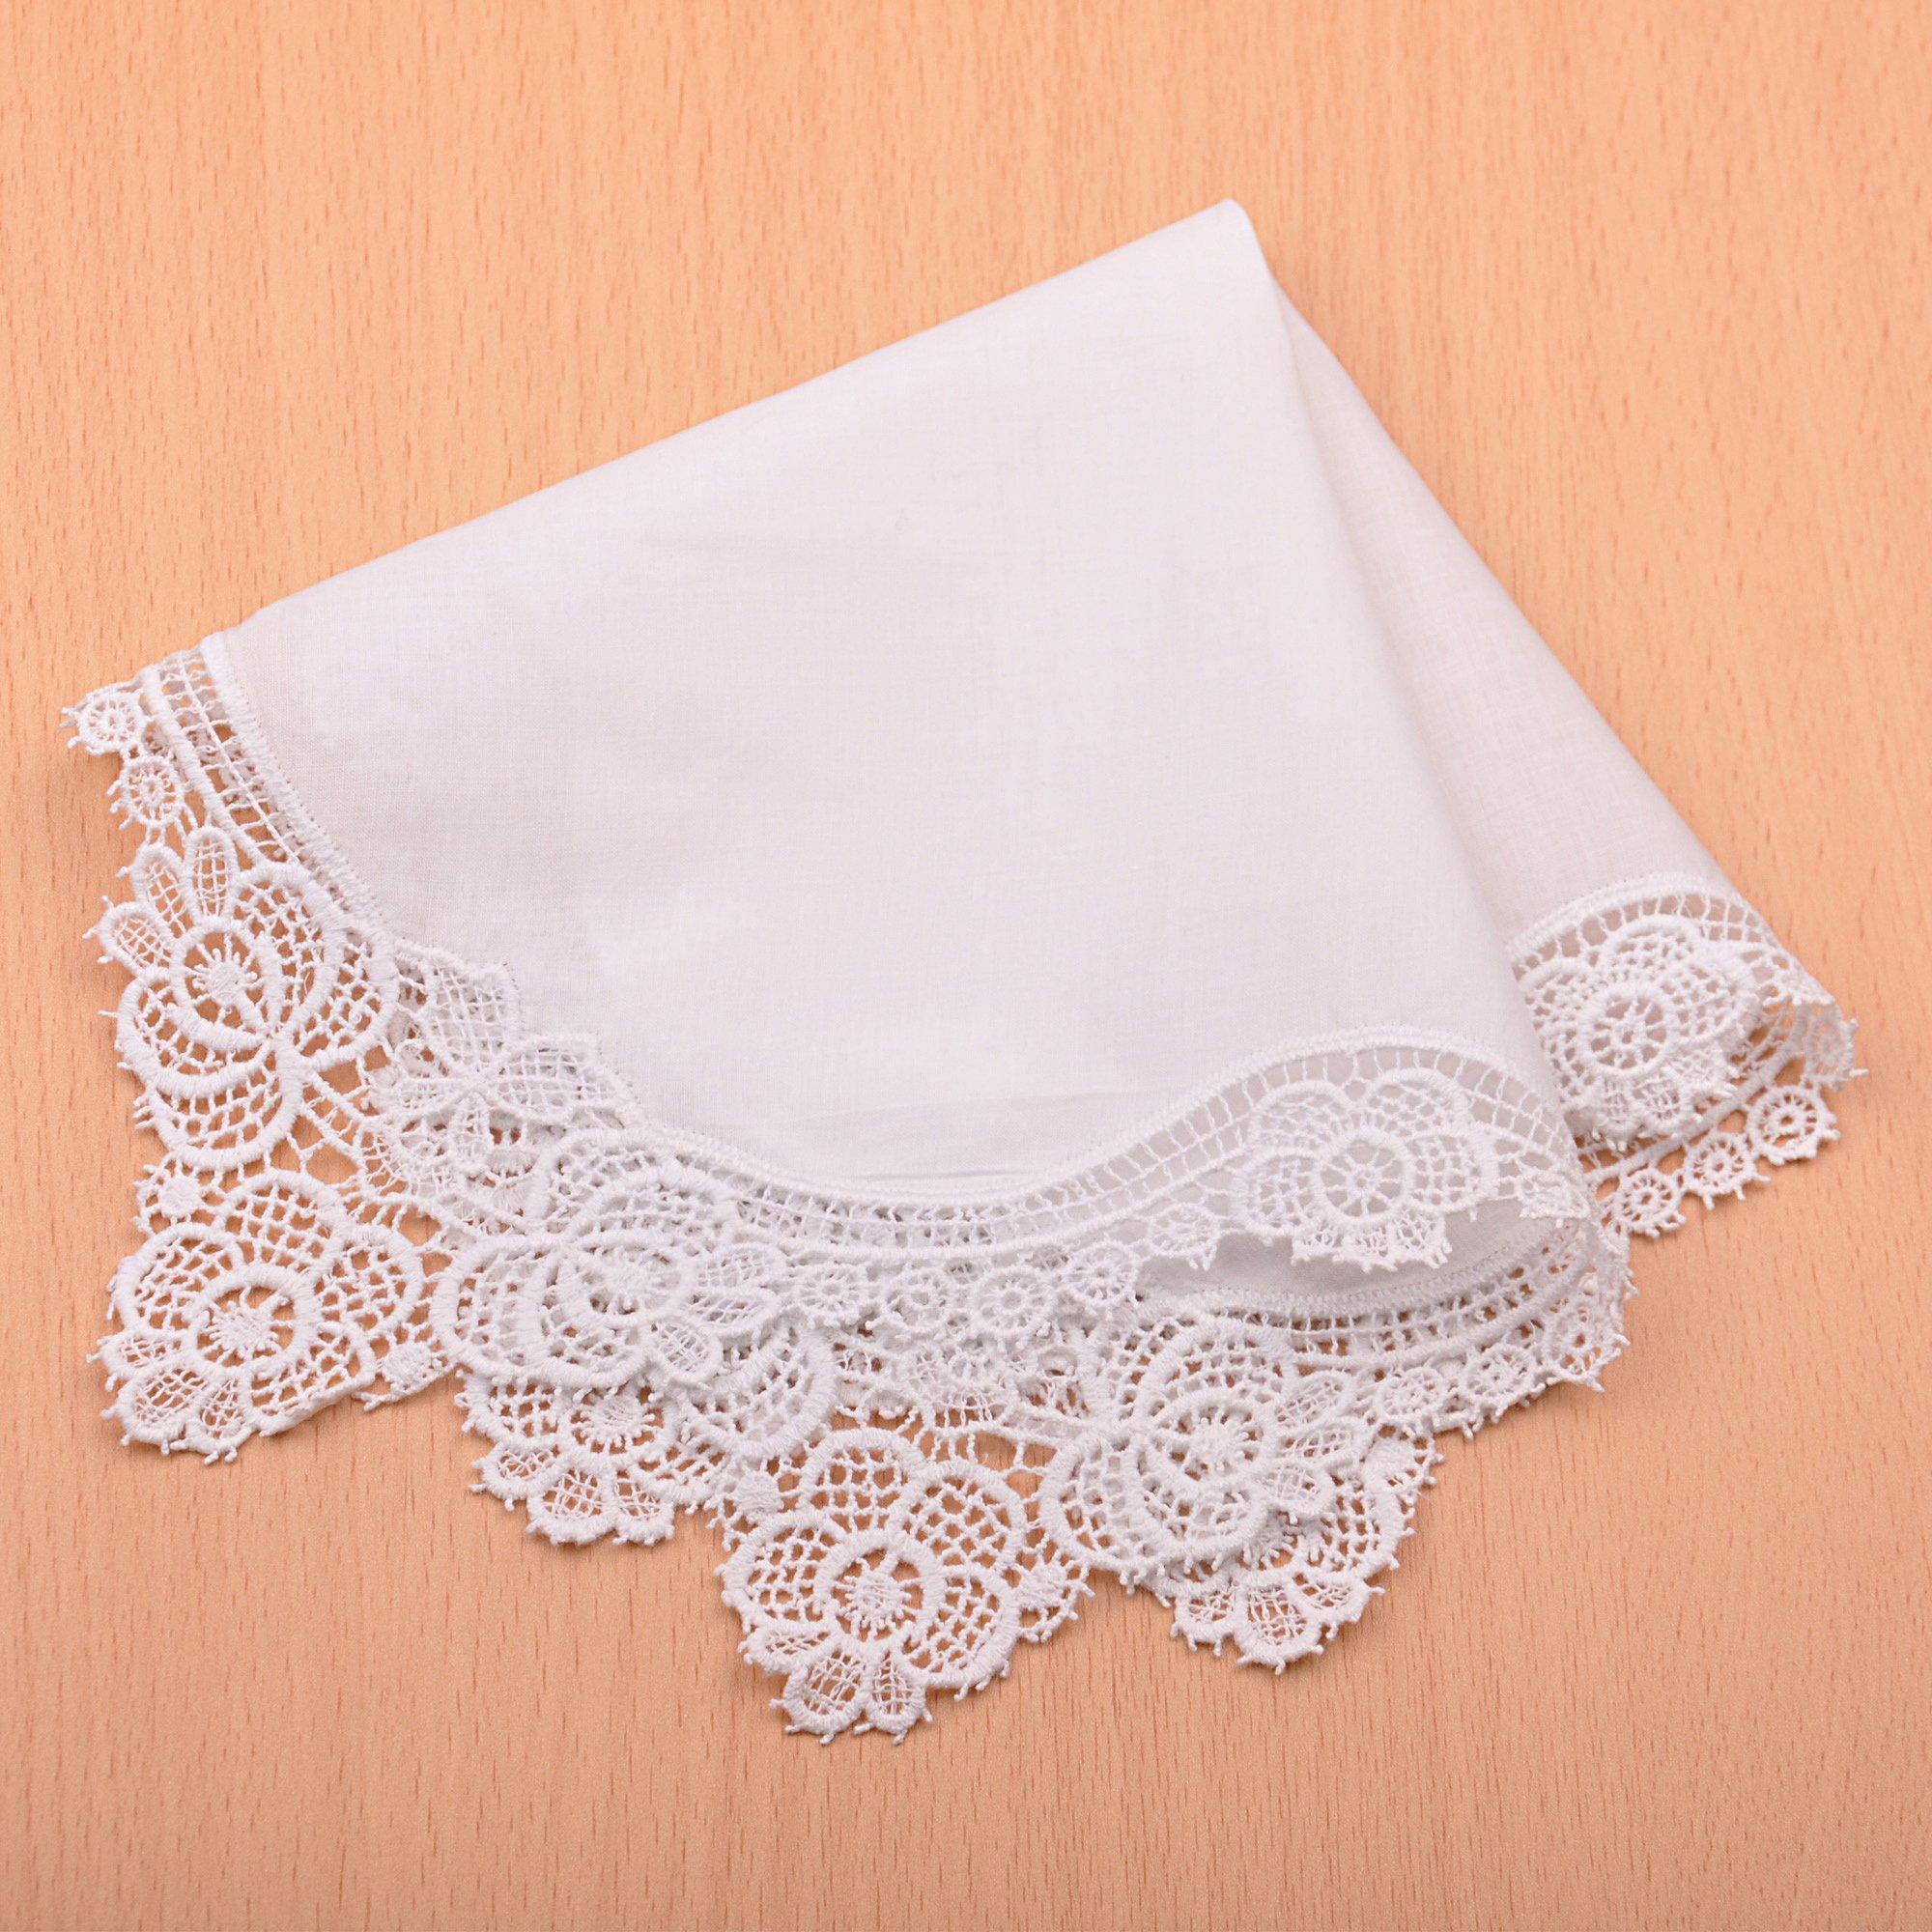 Milesky Bridal Wedding Crochet Lace Handkerchief Premium 60S Cotton CH02 by Milesky (Image #5)